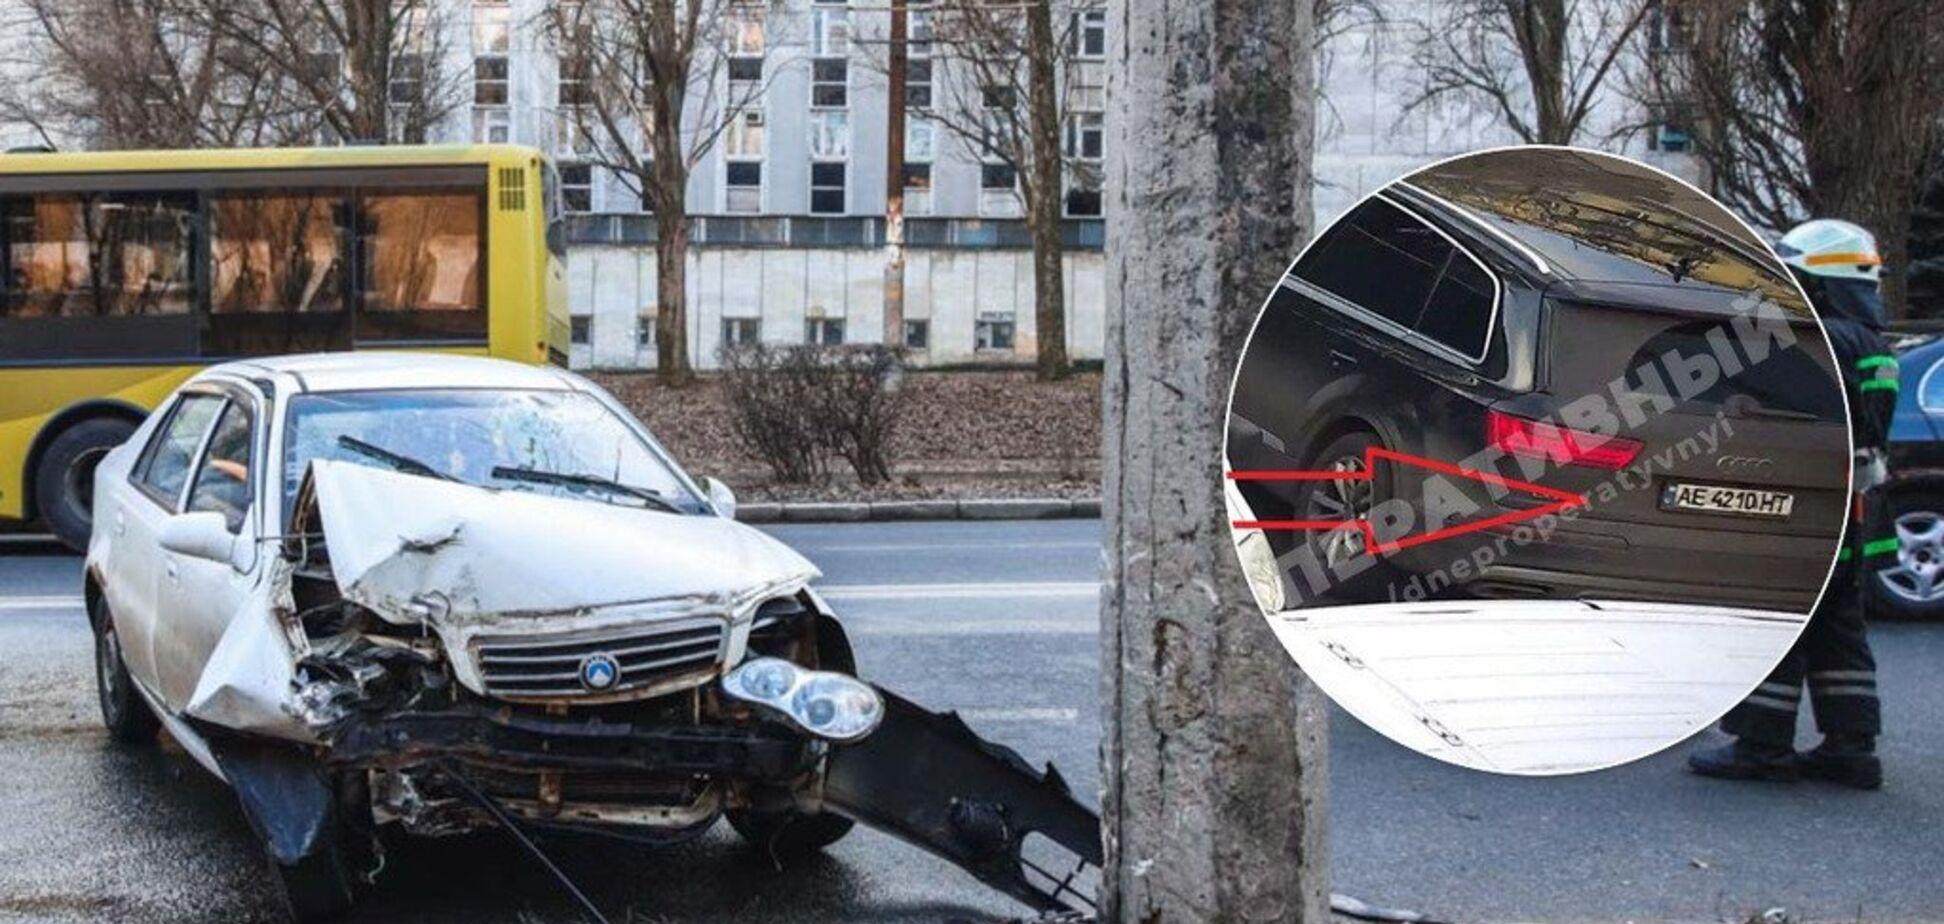 Авто в 'фарш' и много крови: в Днепре Geely на скорости влетел в столб. Фото и видео